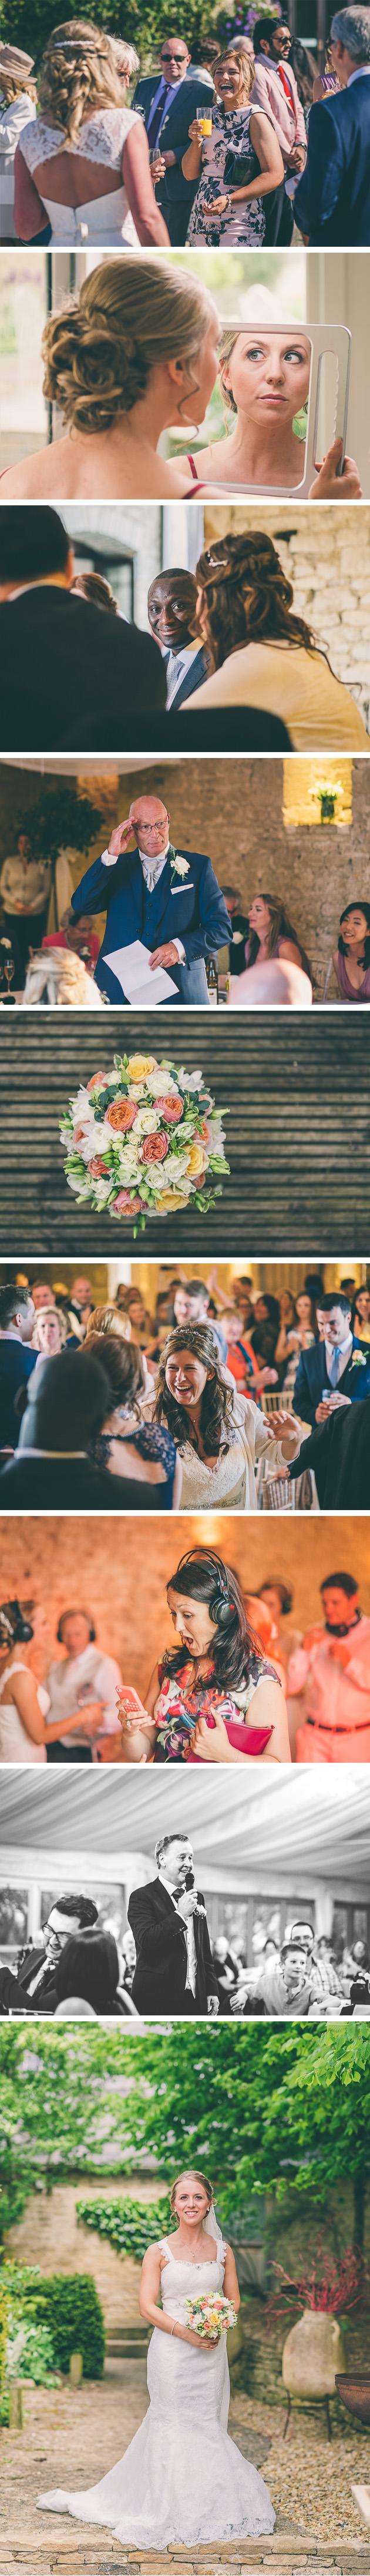 Bride and groom entering wedding breakfast room